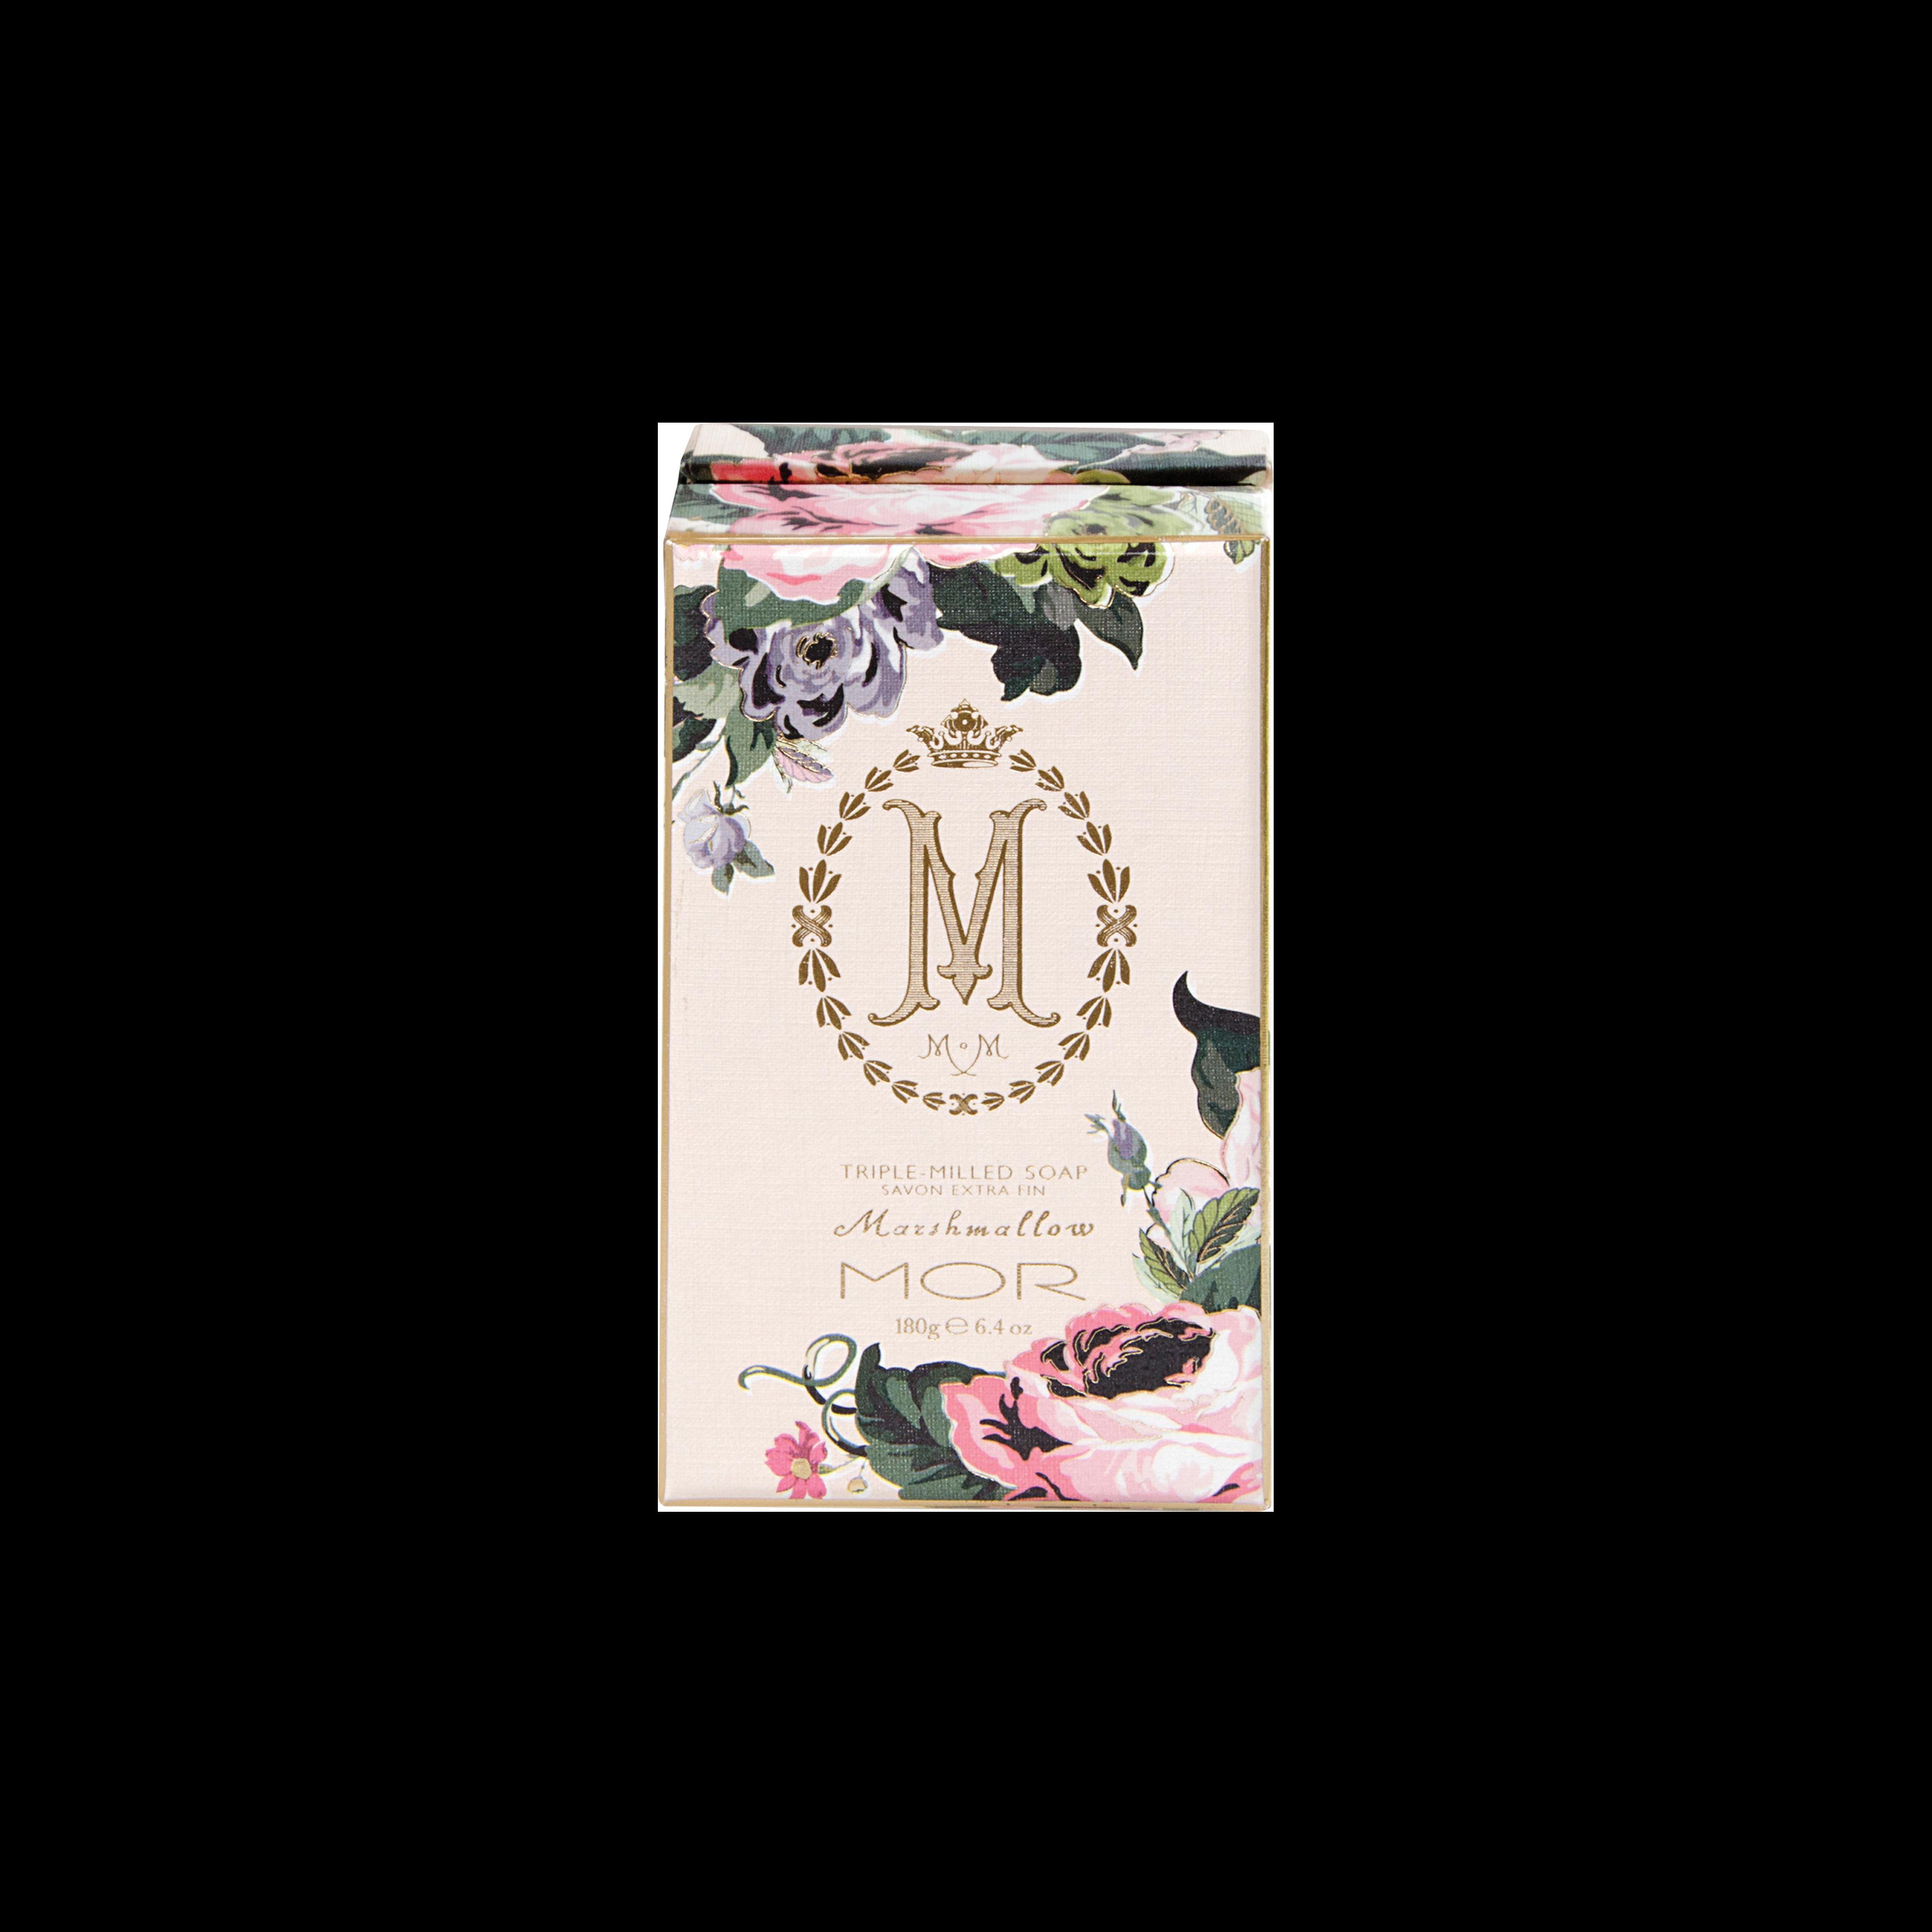 Marshmellow Tripple Milled Soap